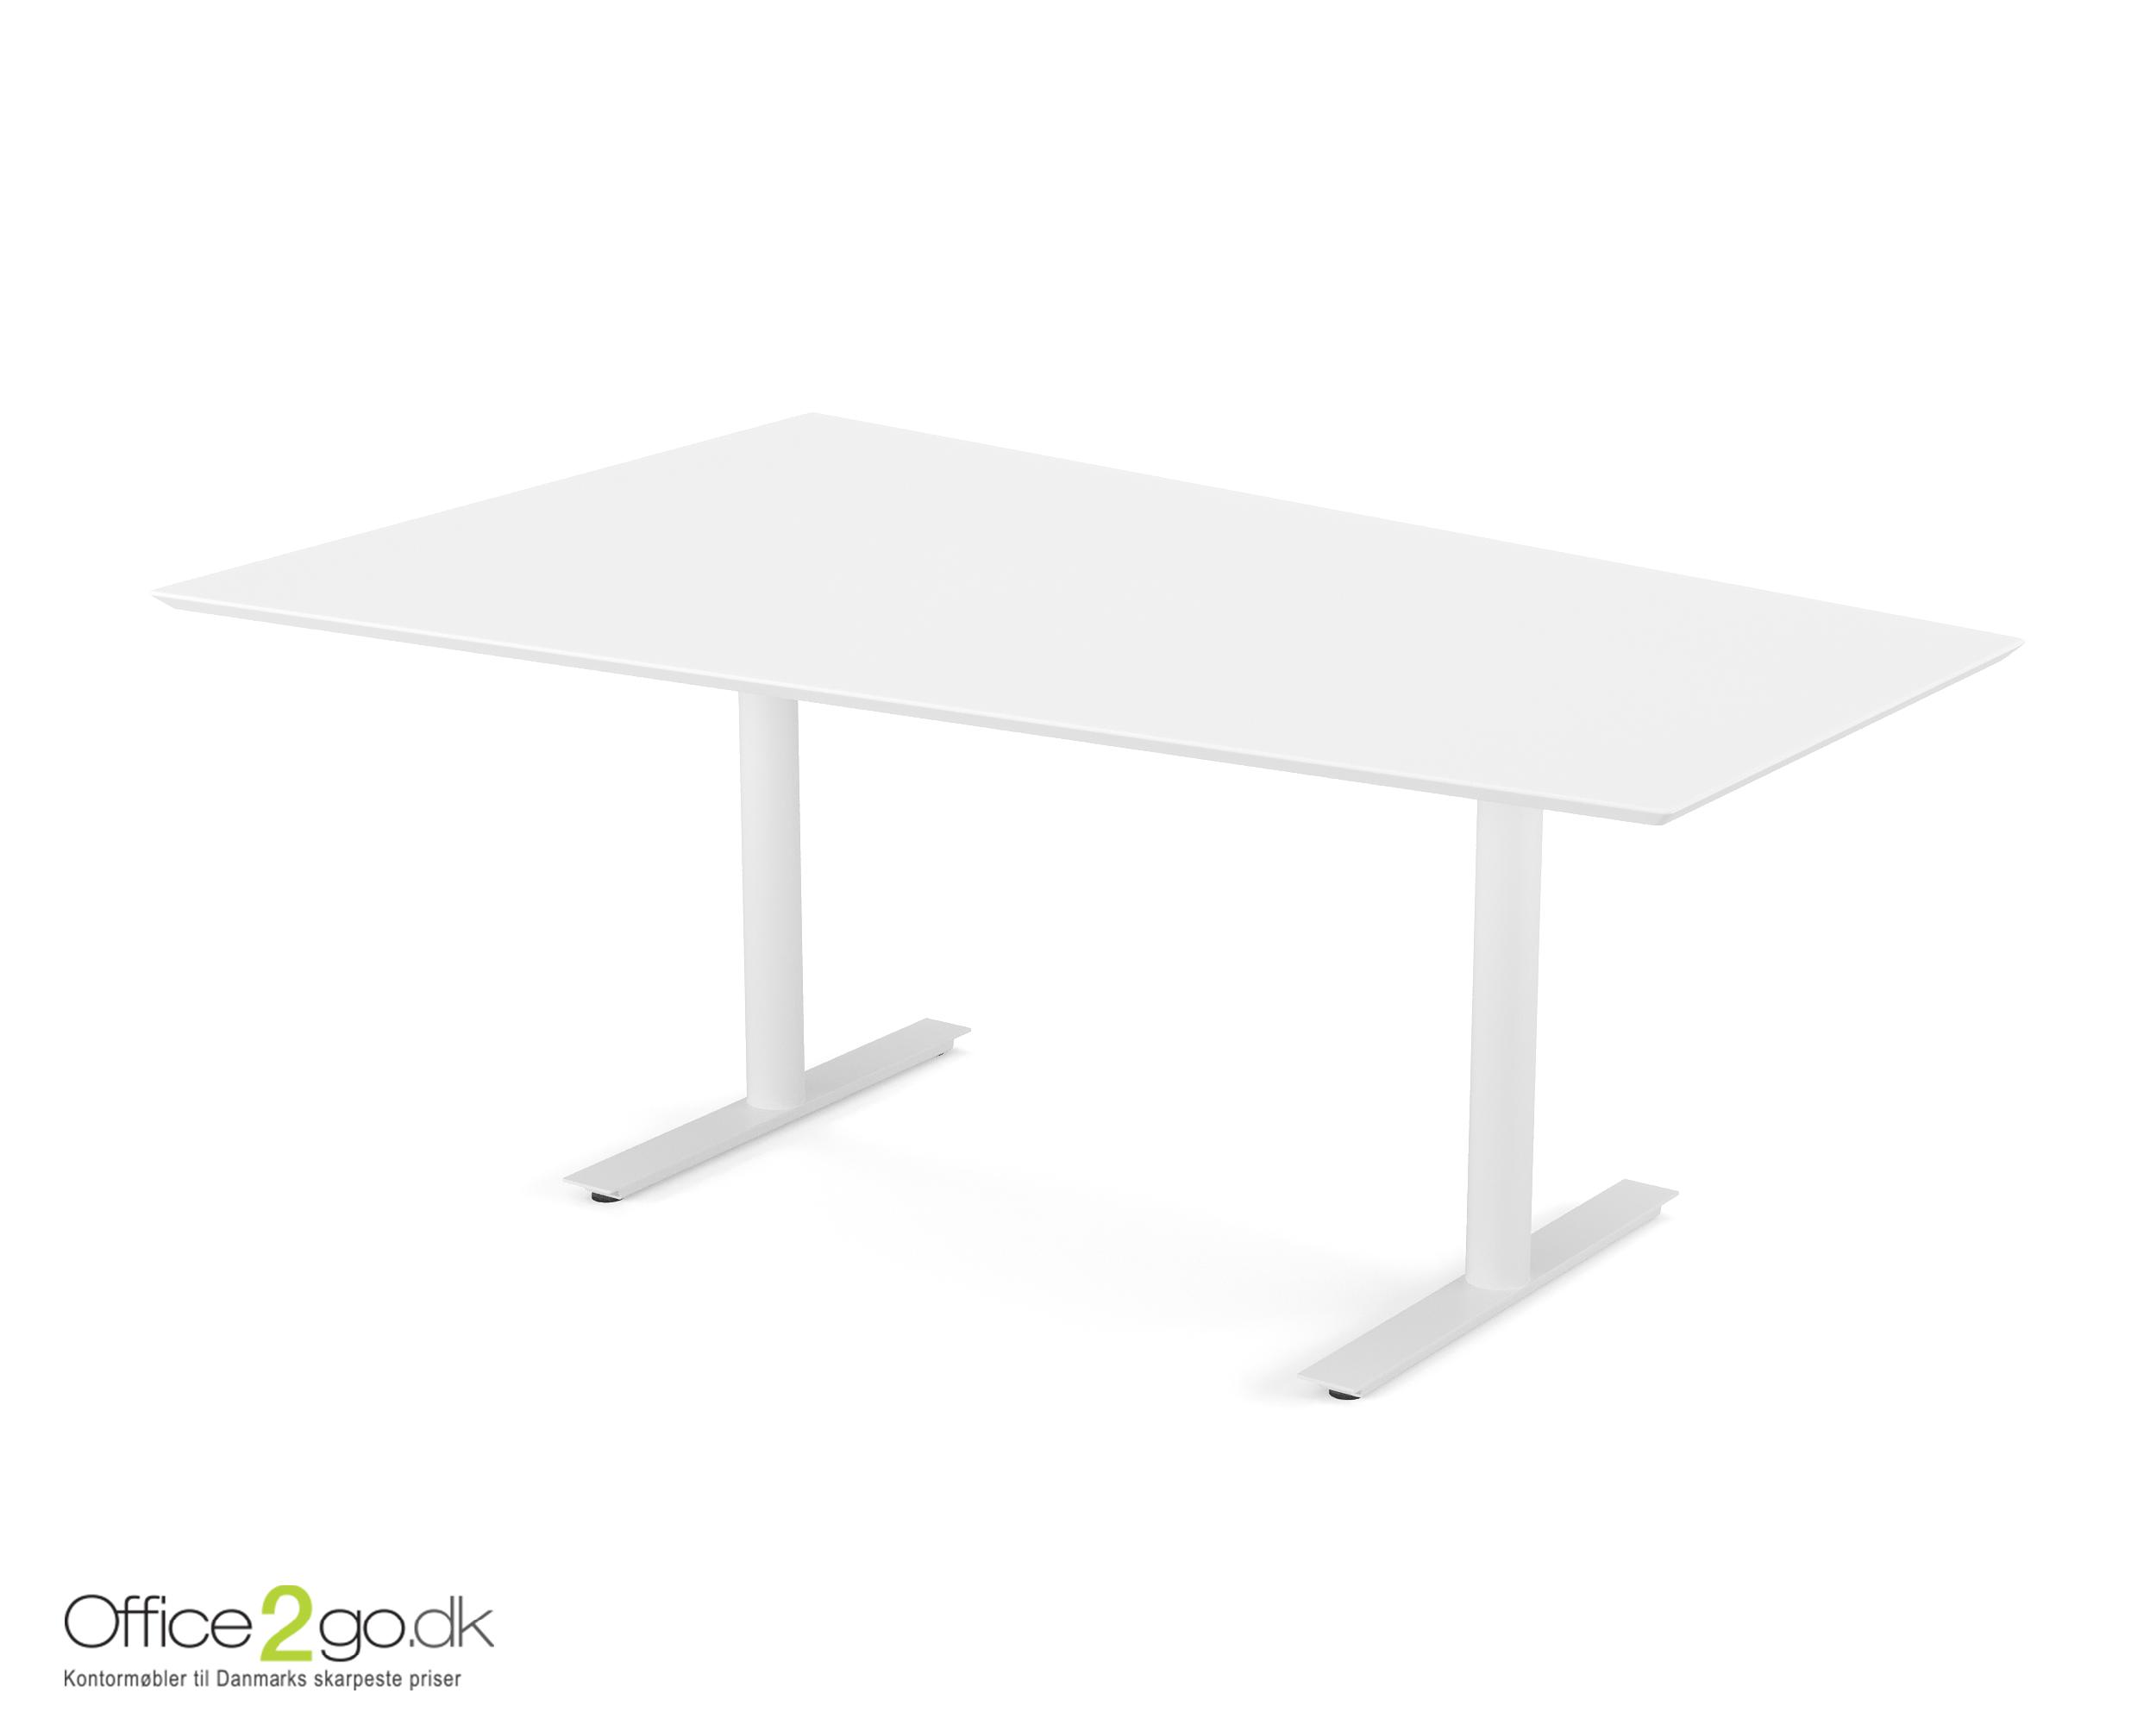 Inline Media mødebord - 6 personer - 180 cm.